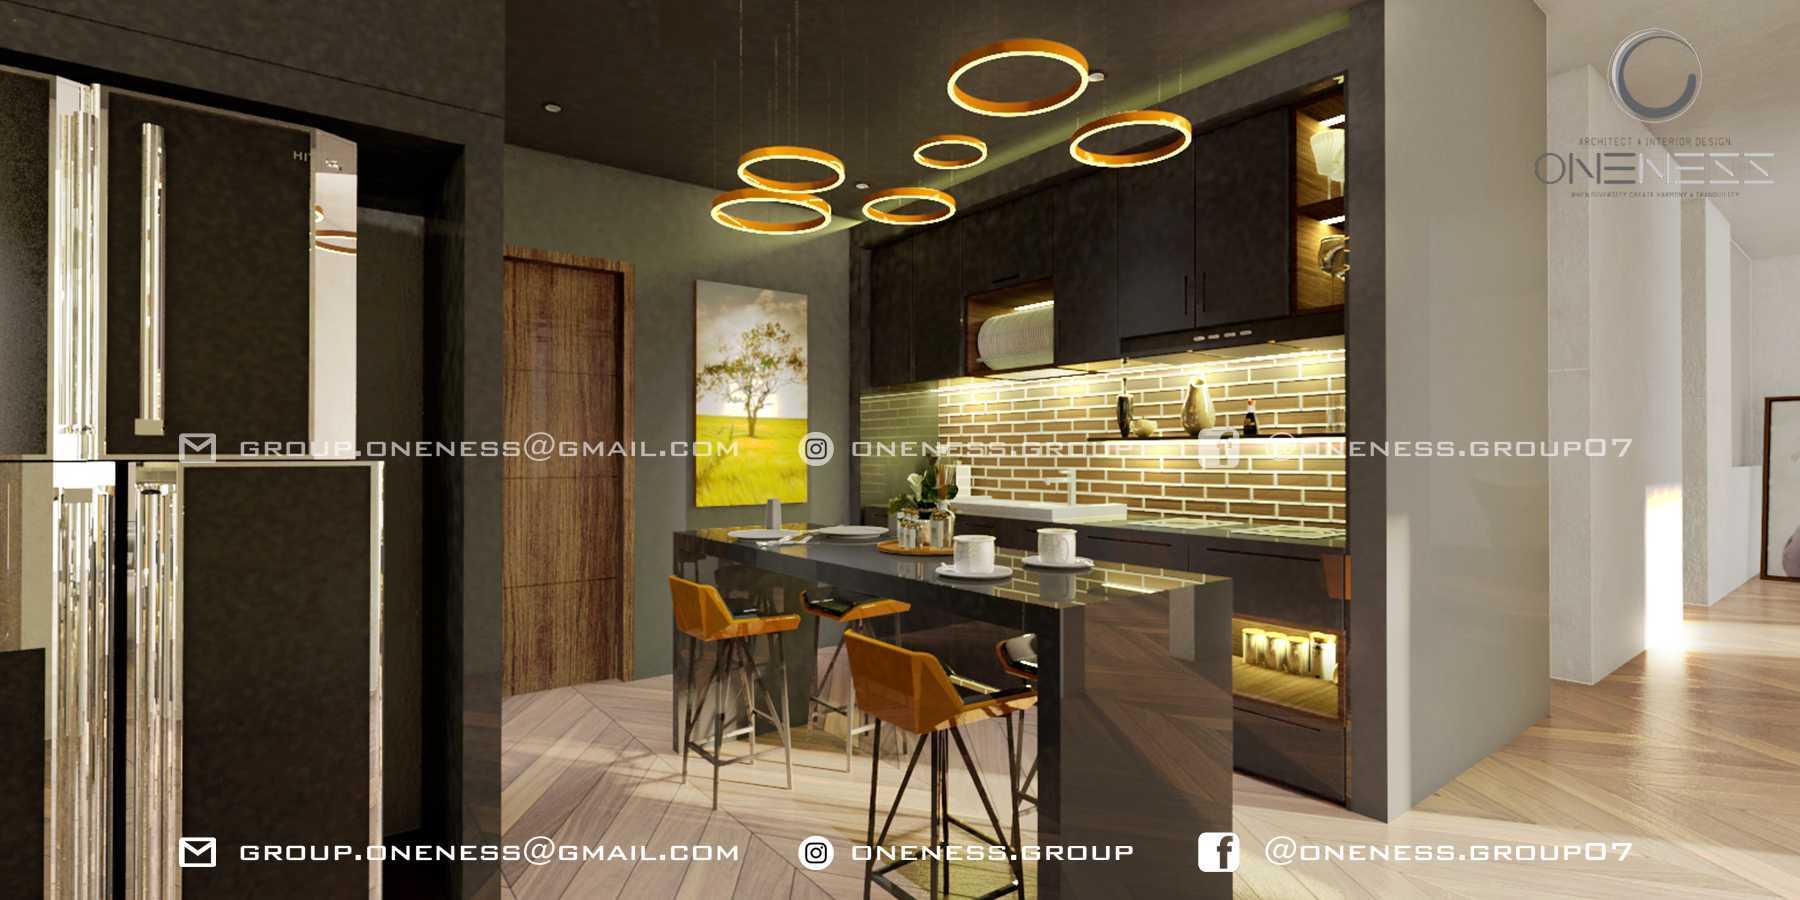 Oneness Group Interior Apartment Tangerang, Kota Tangerang, Banten, Indonesia Tangerang, Kota Tangerang, Banten, Indonesia Ruang Makan  98238